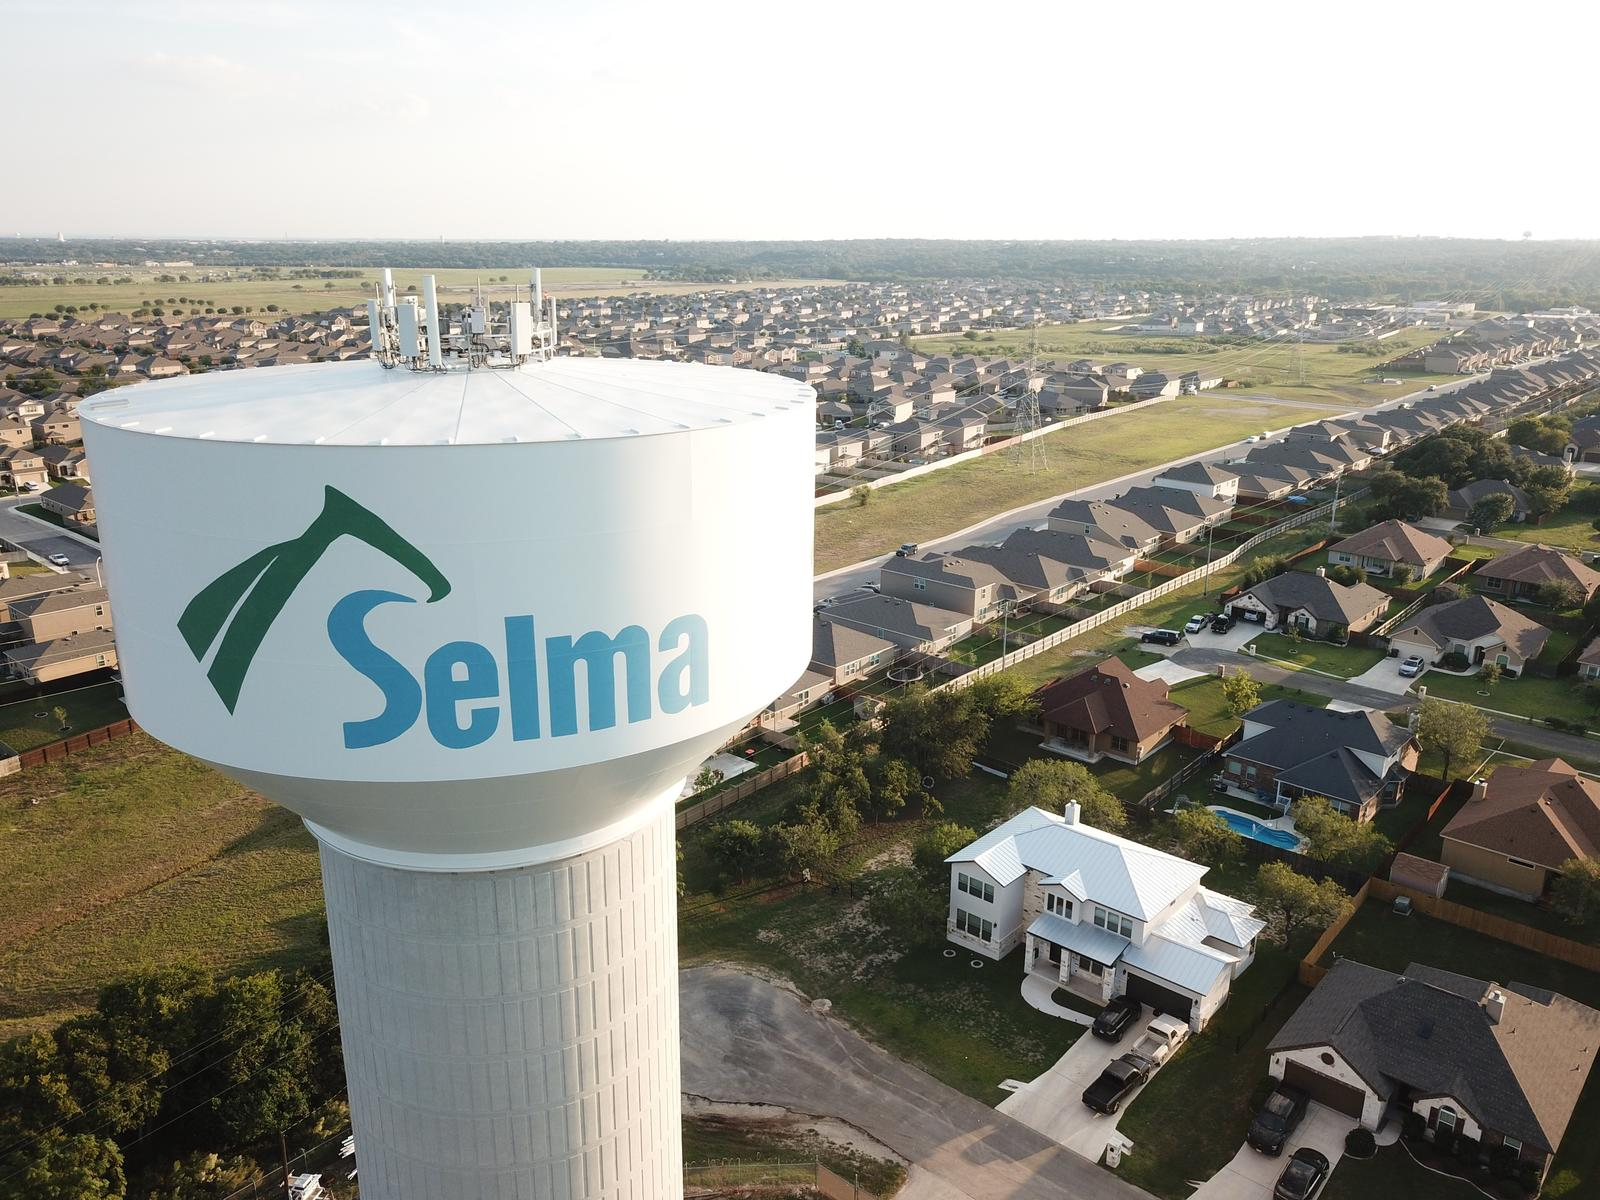 Selma Limo Rental Services San Antonio Limo Rental